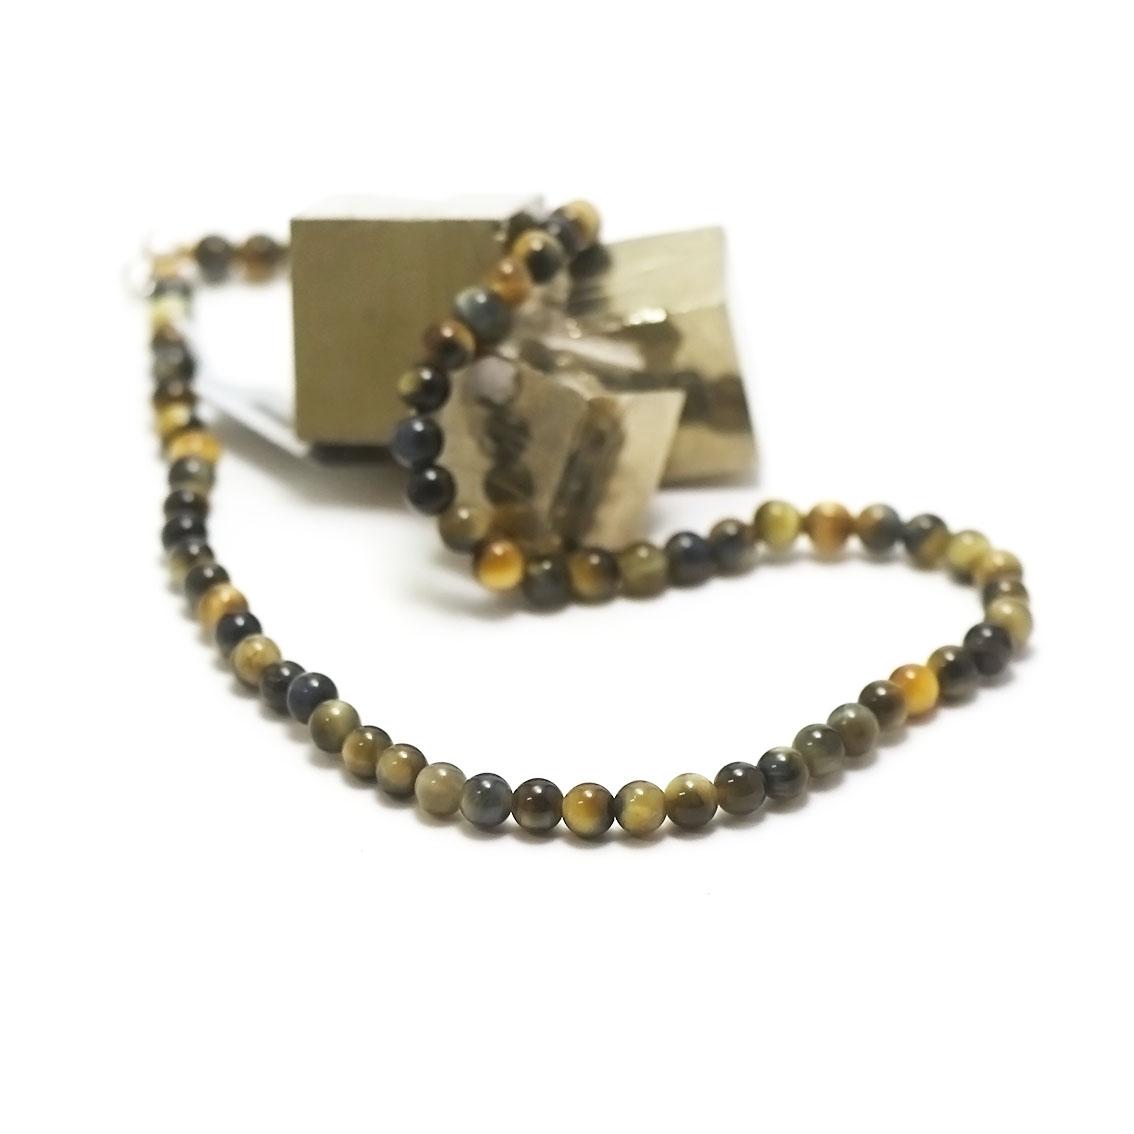 collier oeil de tigre doré, perle ronde 6 mm